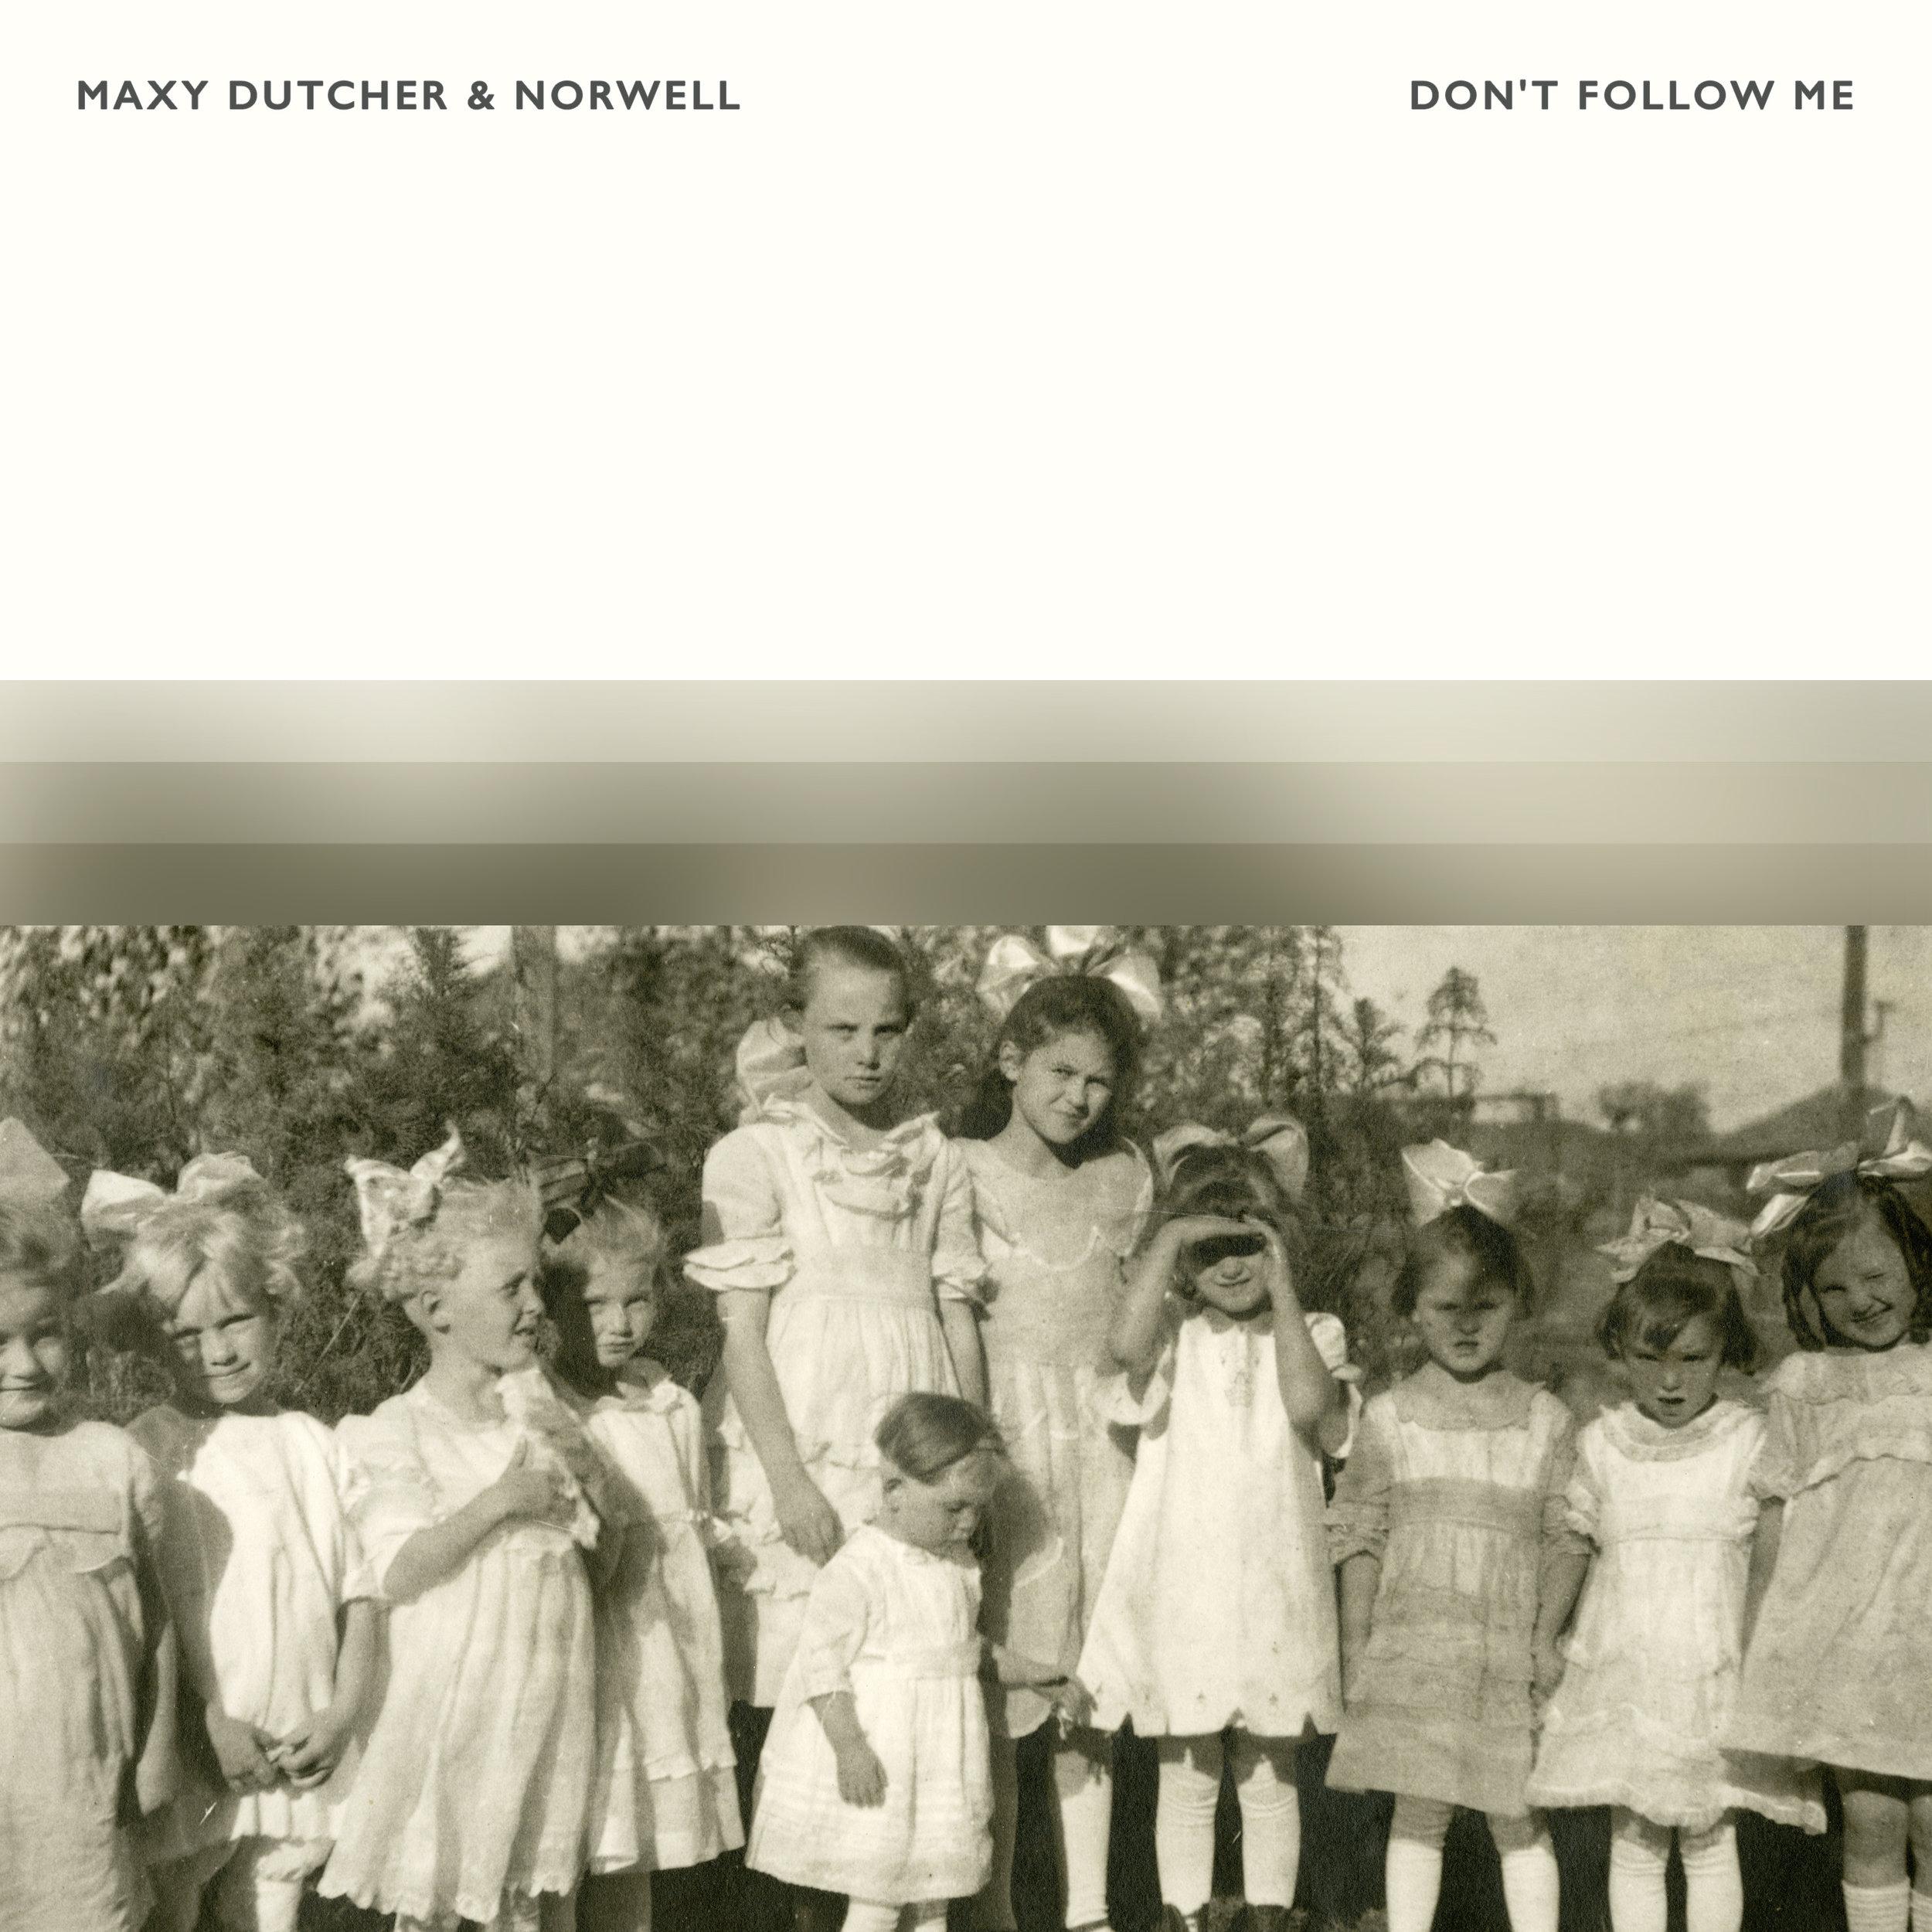 Maxy Dutcher & Norwell - Don't Follow Me